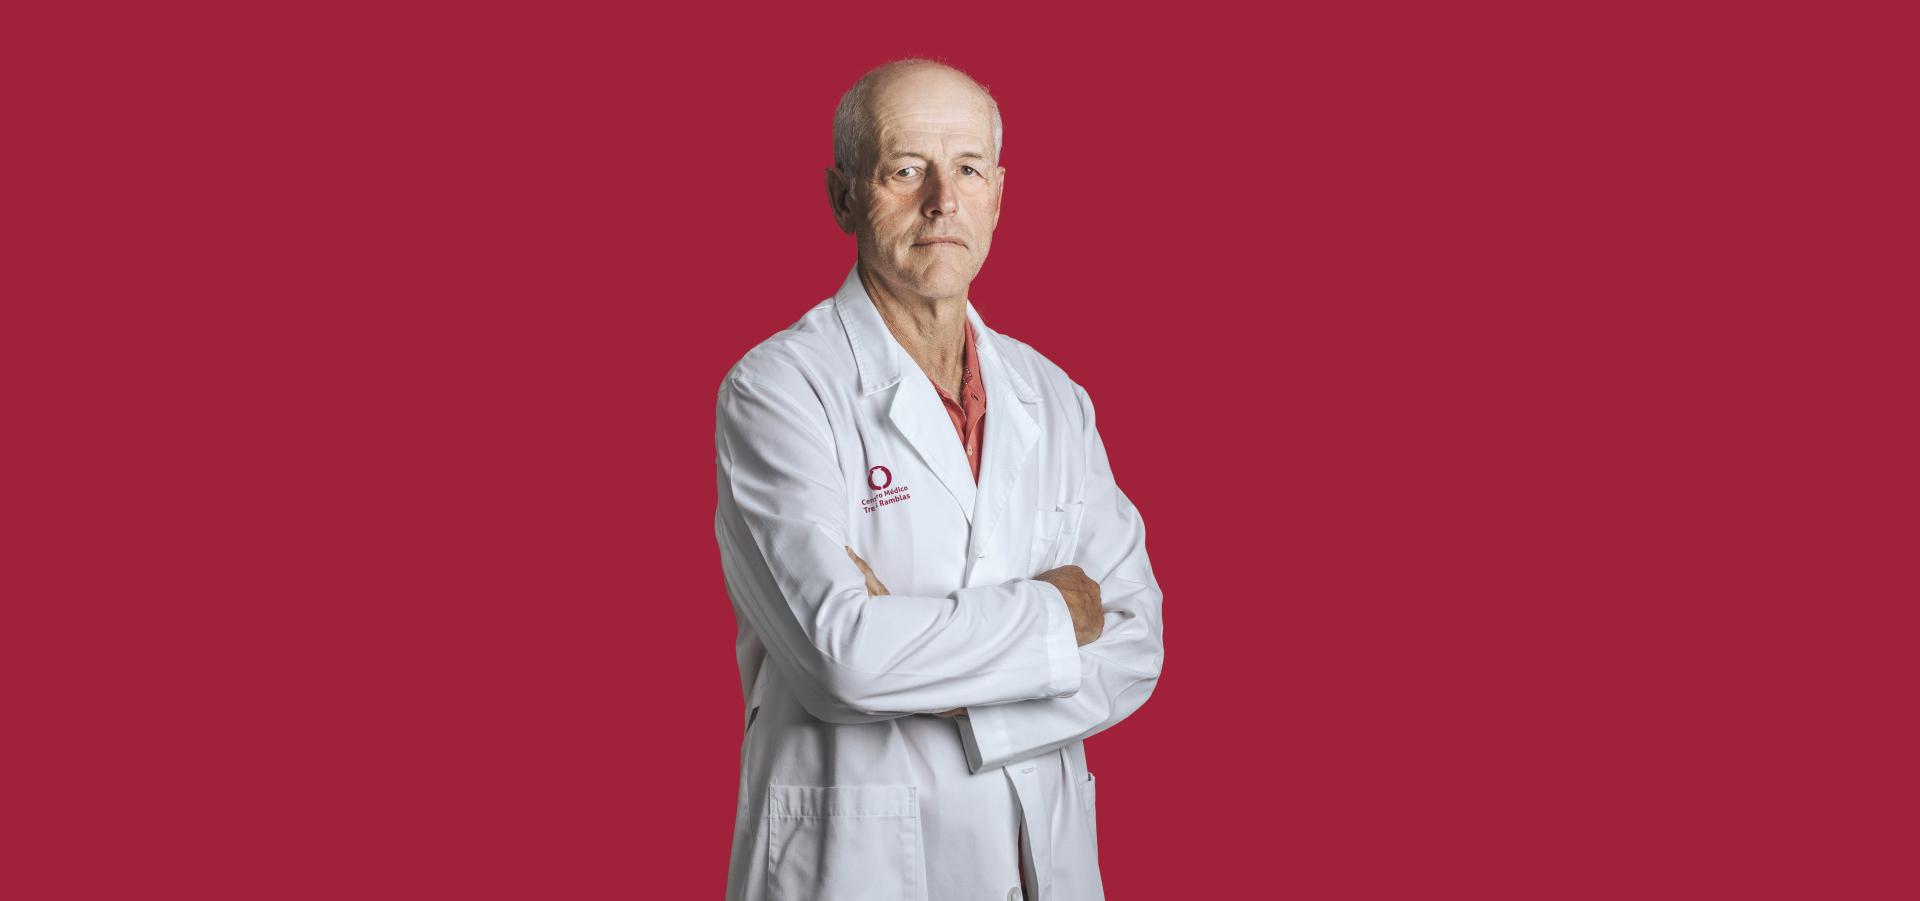 Dr. Francisco Molina Iglesias